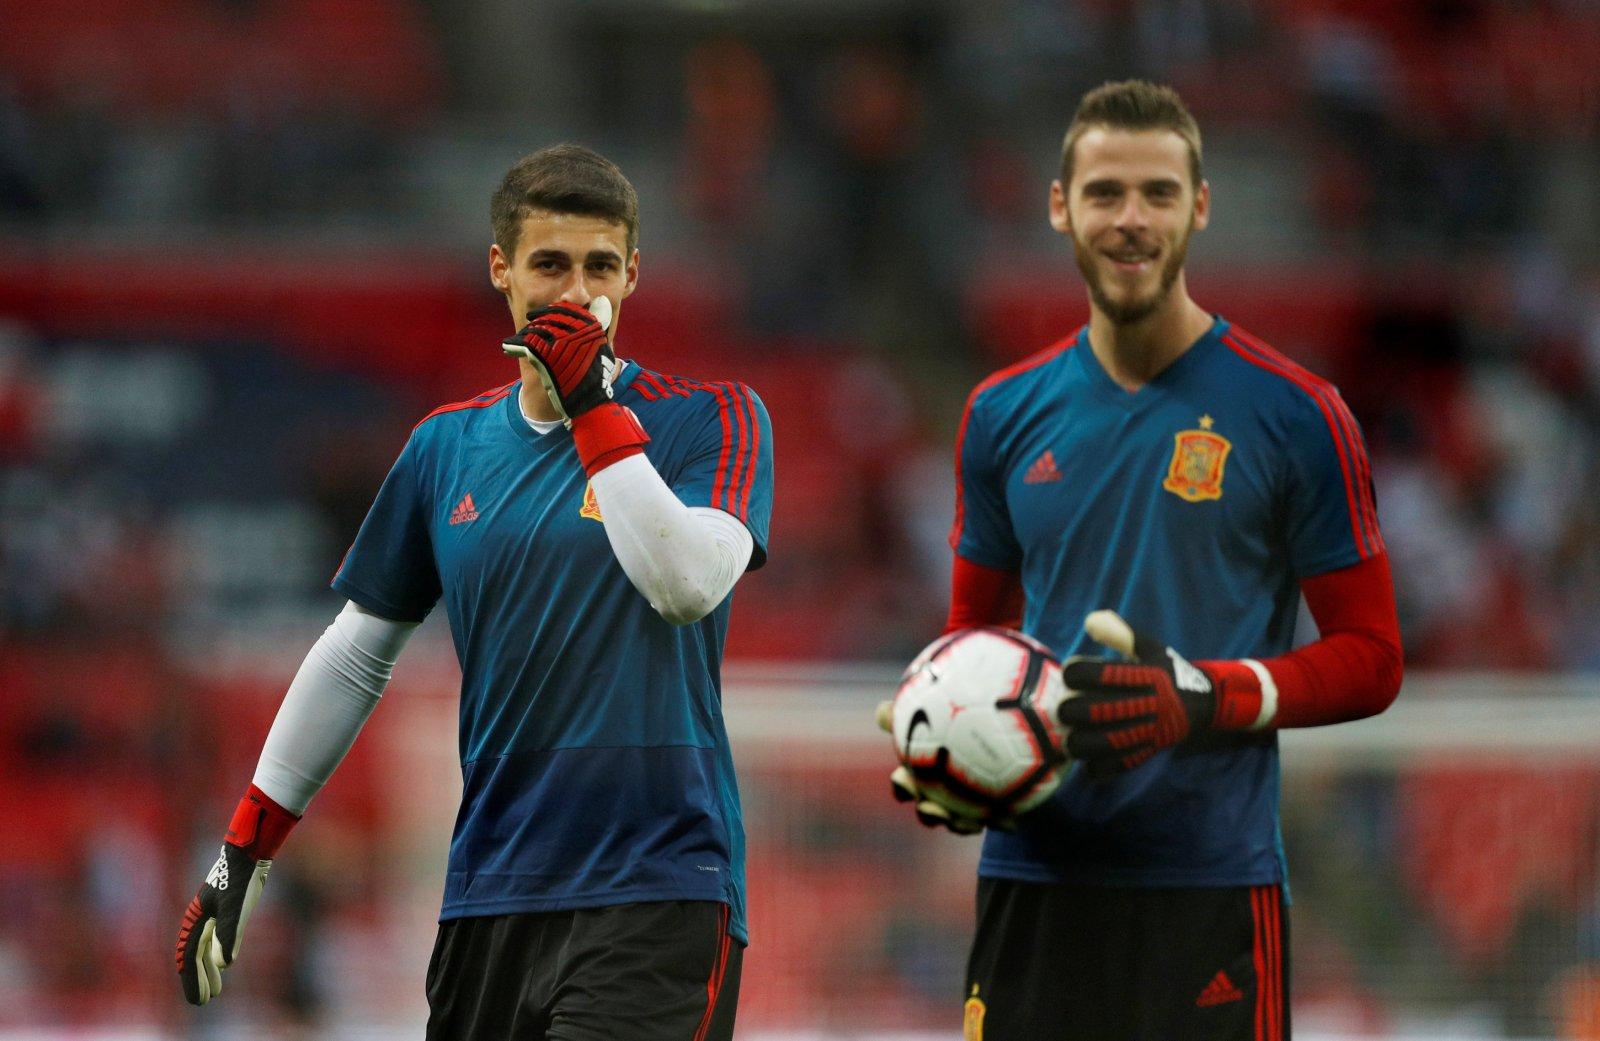 Alasan De Gea Jarang Dimainkan Pada Kualifikasi EURO 2020